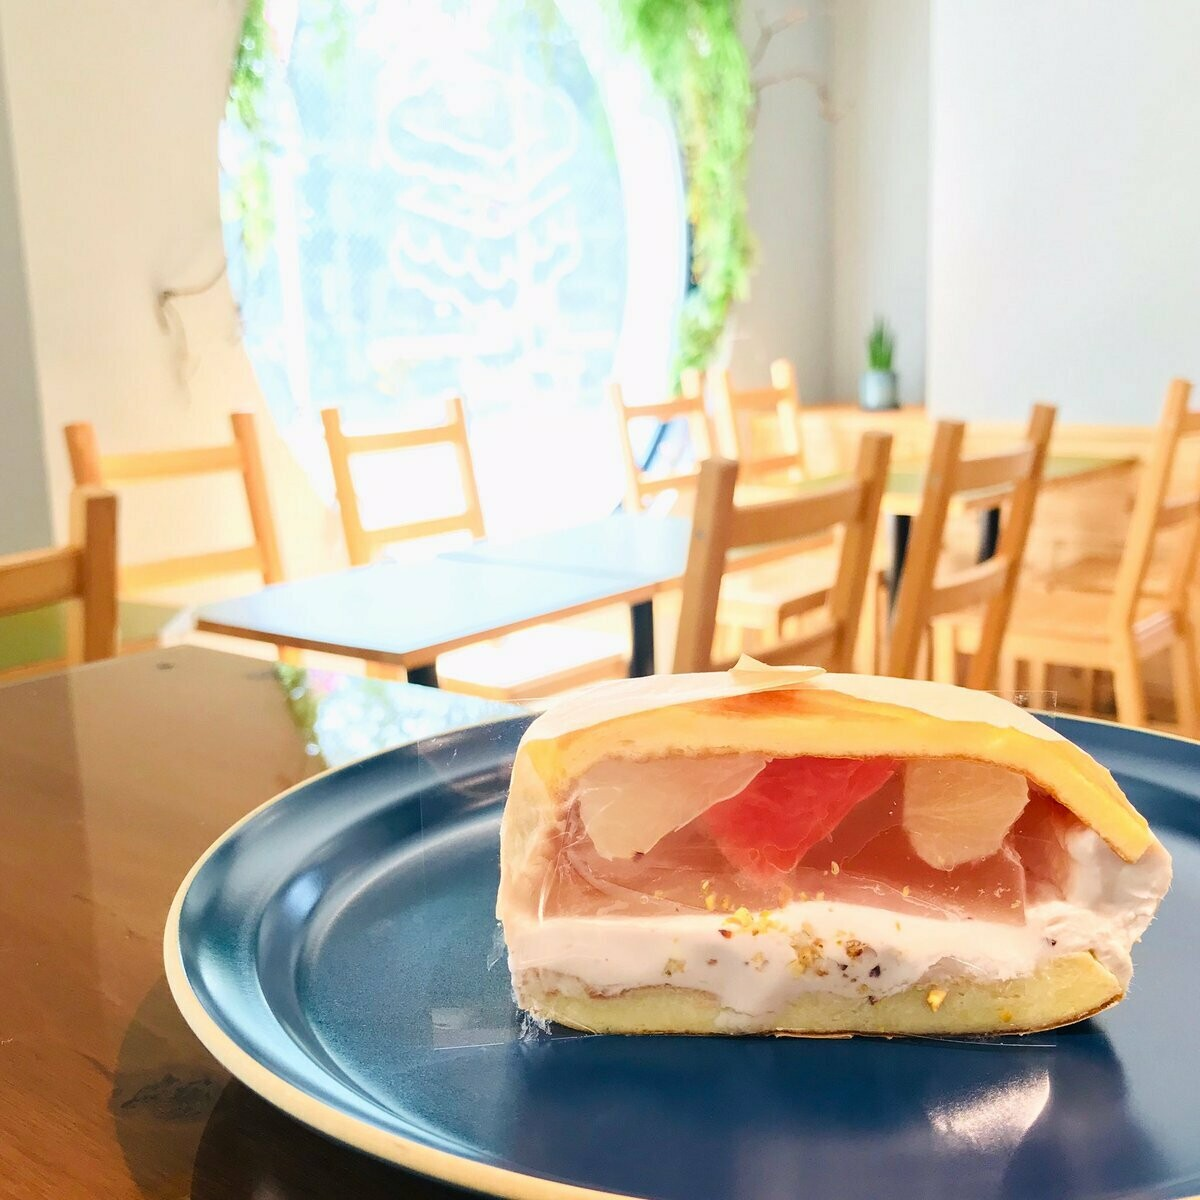 MOCMOsandwiches 柑橘ジュレとカシスクリーム(土日配達不可)